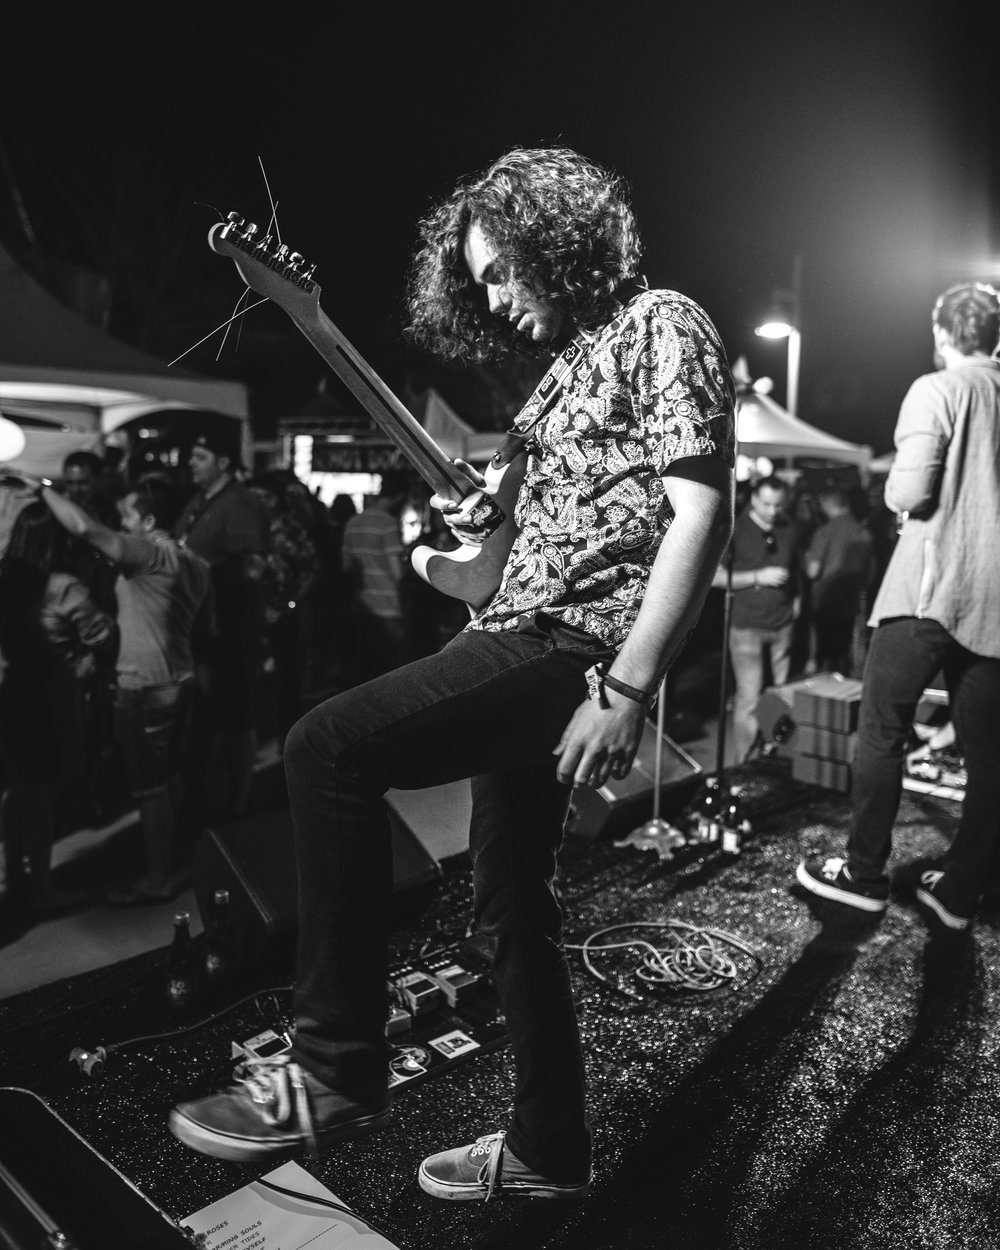 barefoot crushbrew festival scottsdale 2016 4 eric folts.jpg